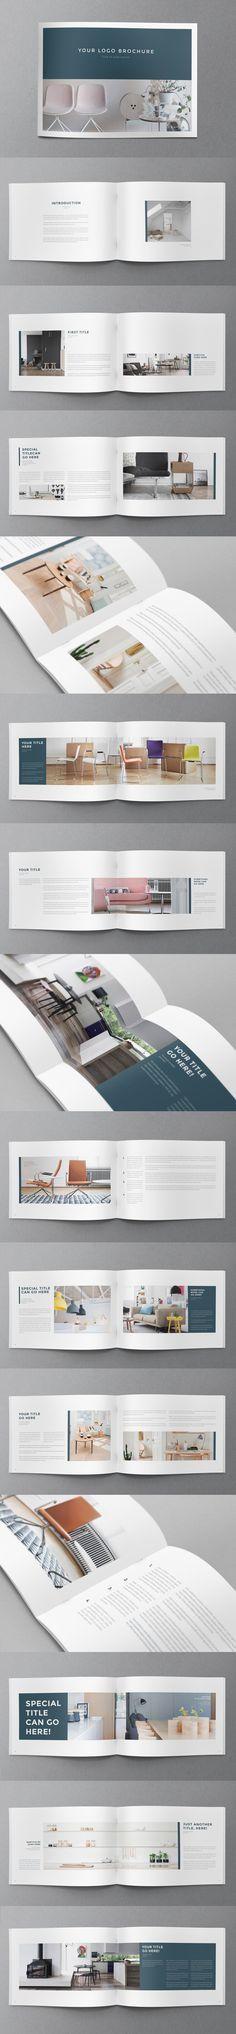 Interior Design Minimal Brochure. Download here: http://graphicriver.net/item/interior-design-minimal-brochure/11243000?ref=abradesign #brochure #design